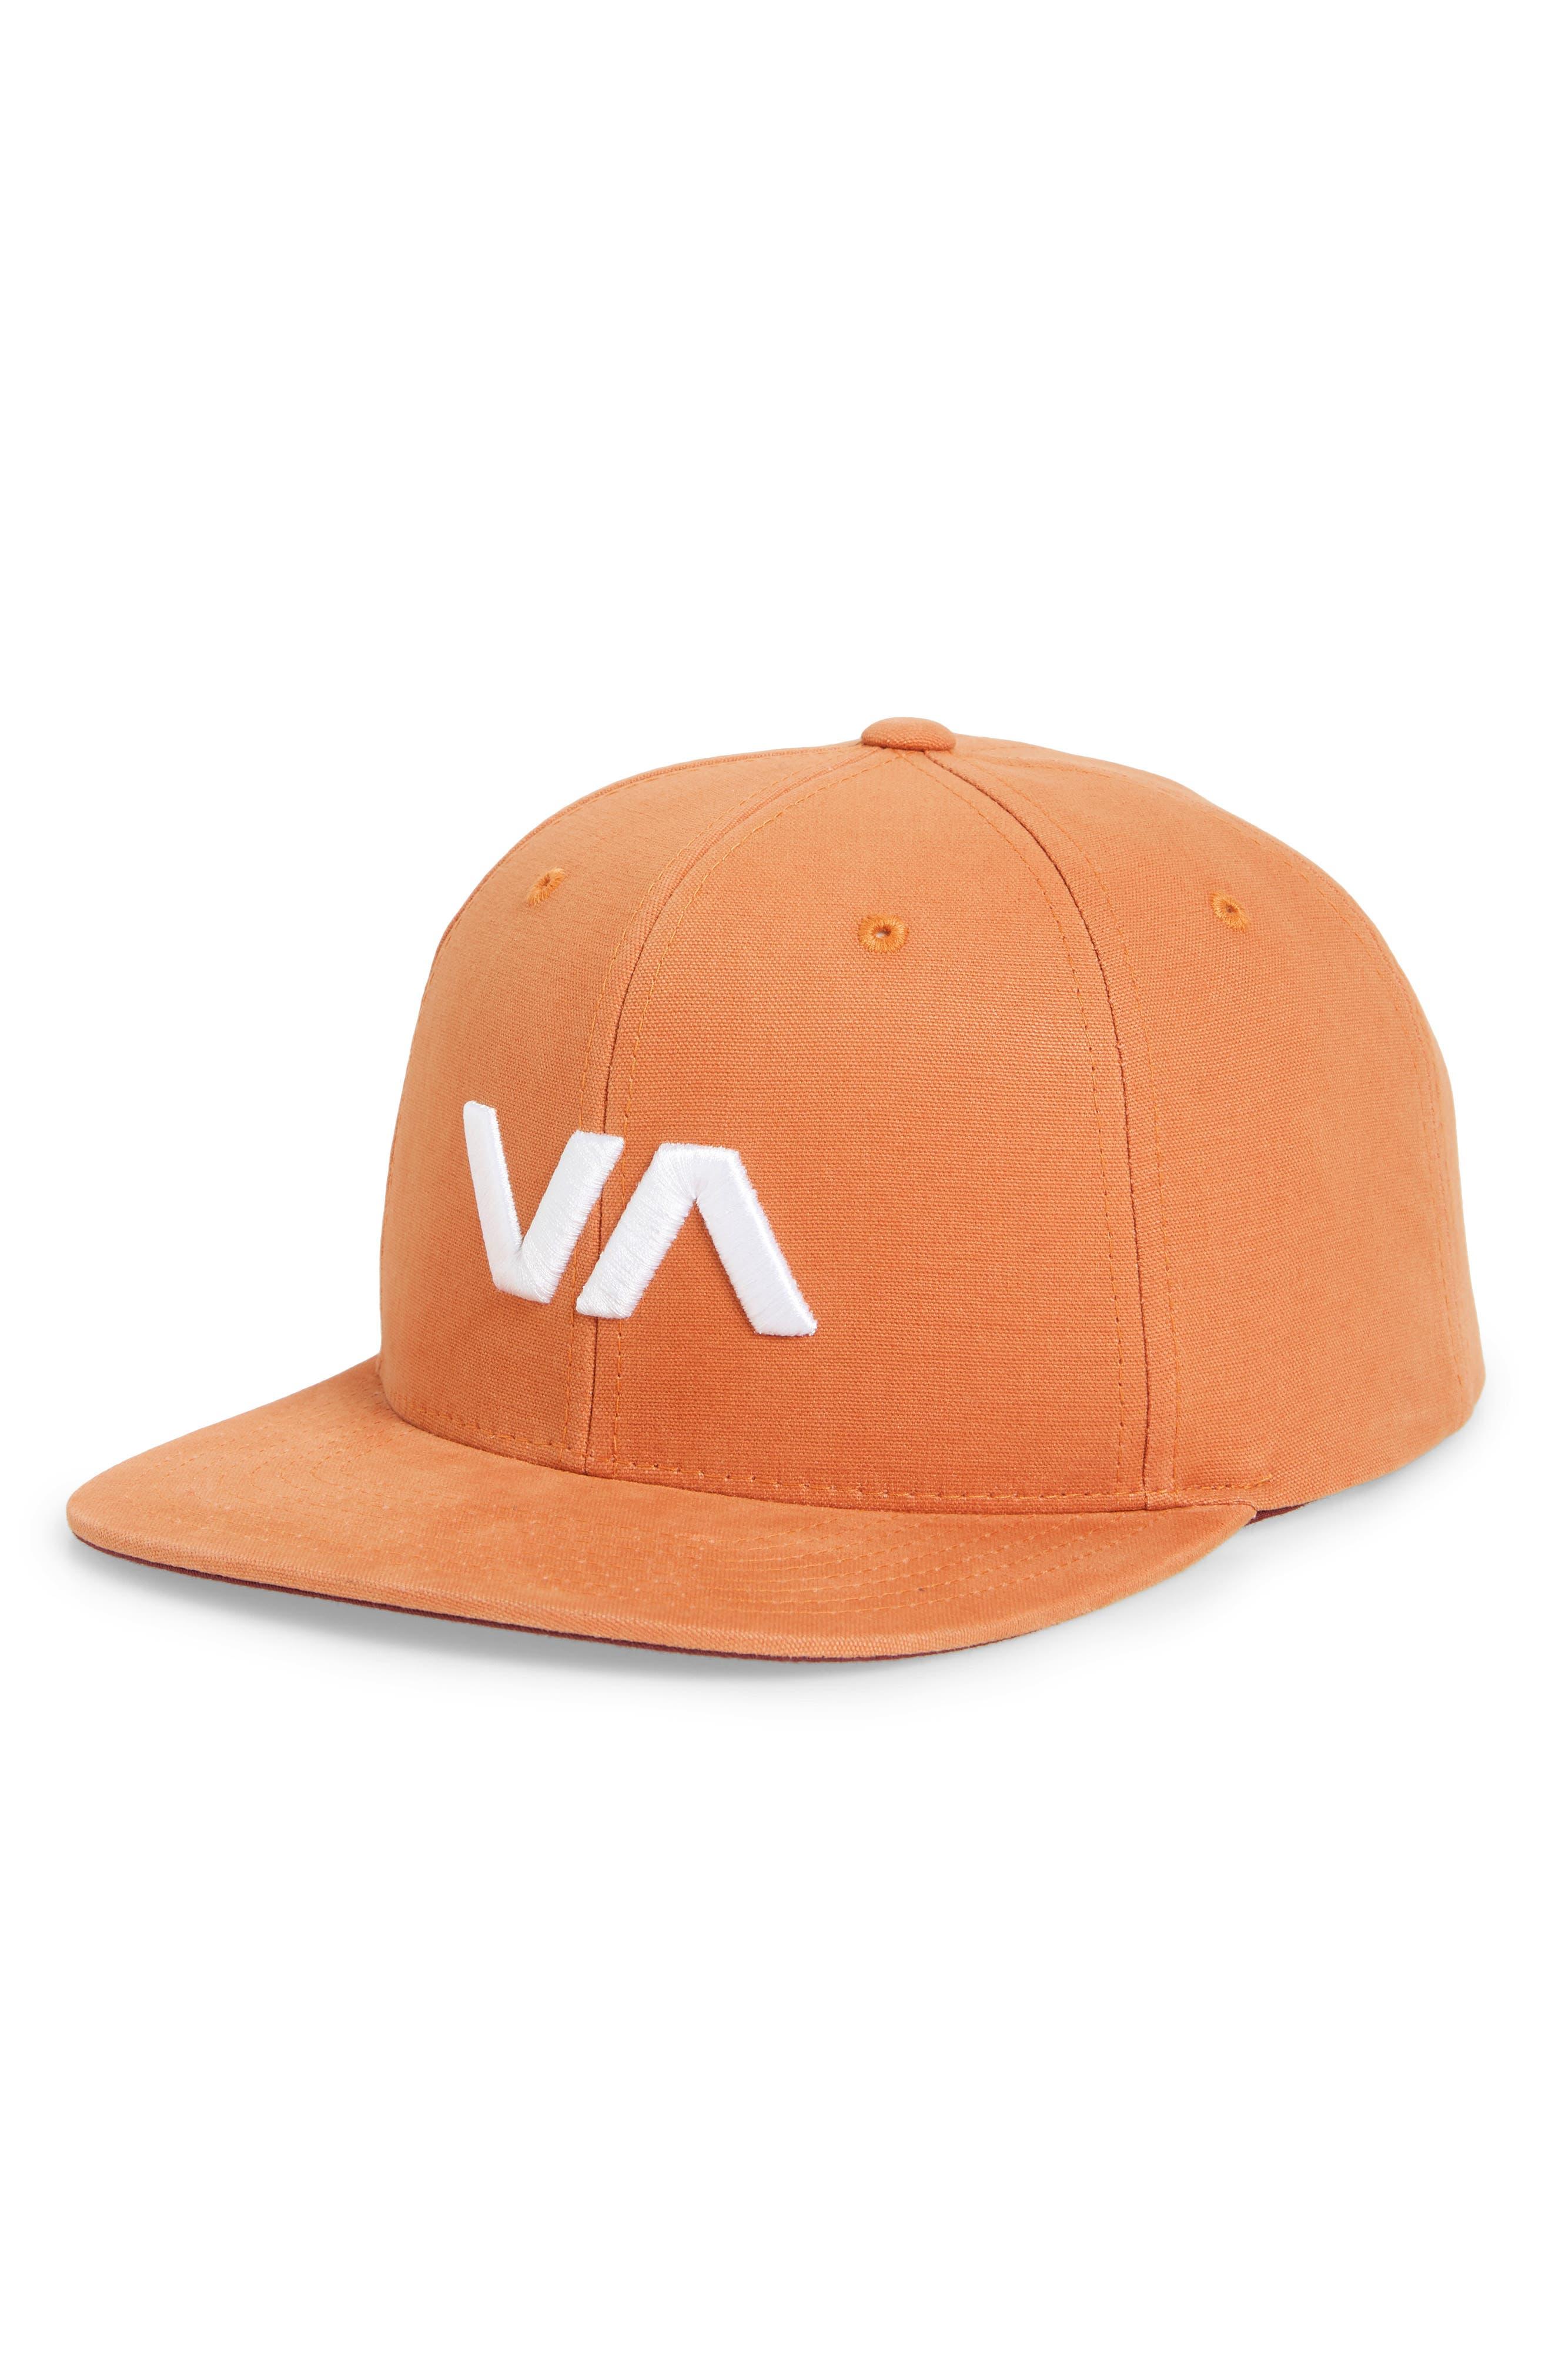 RVCA, VA Snapback II Snapback Hat, Main thumbnail 1, color, BRICK RED